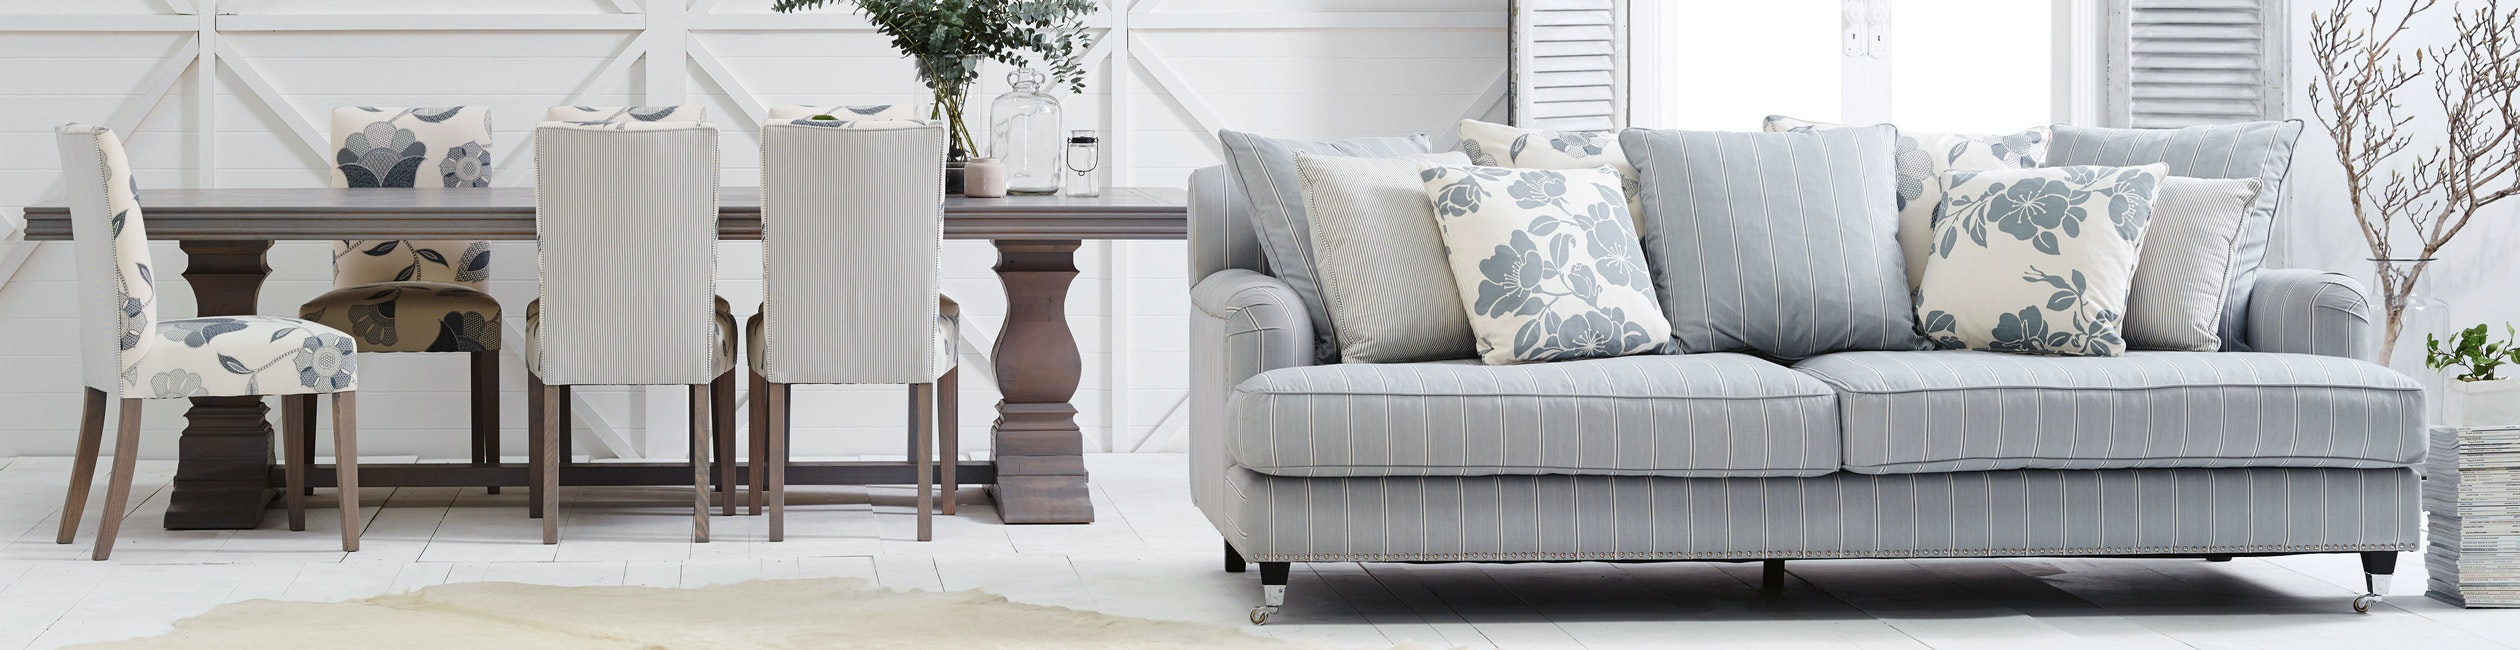 Furniture U2013 Office, Lounge, Entertainment Units U0026 Dining | Domayne Part 50